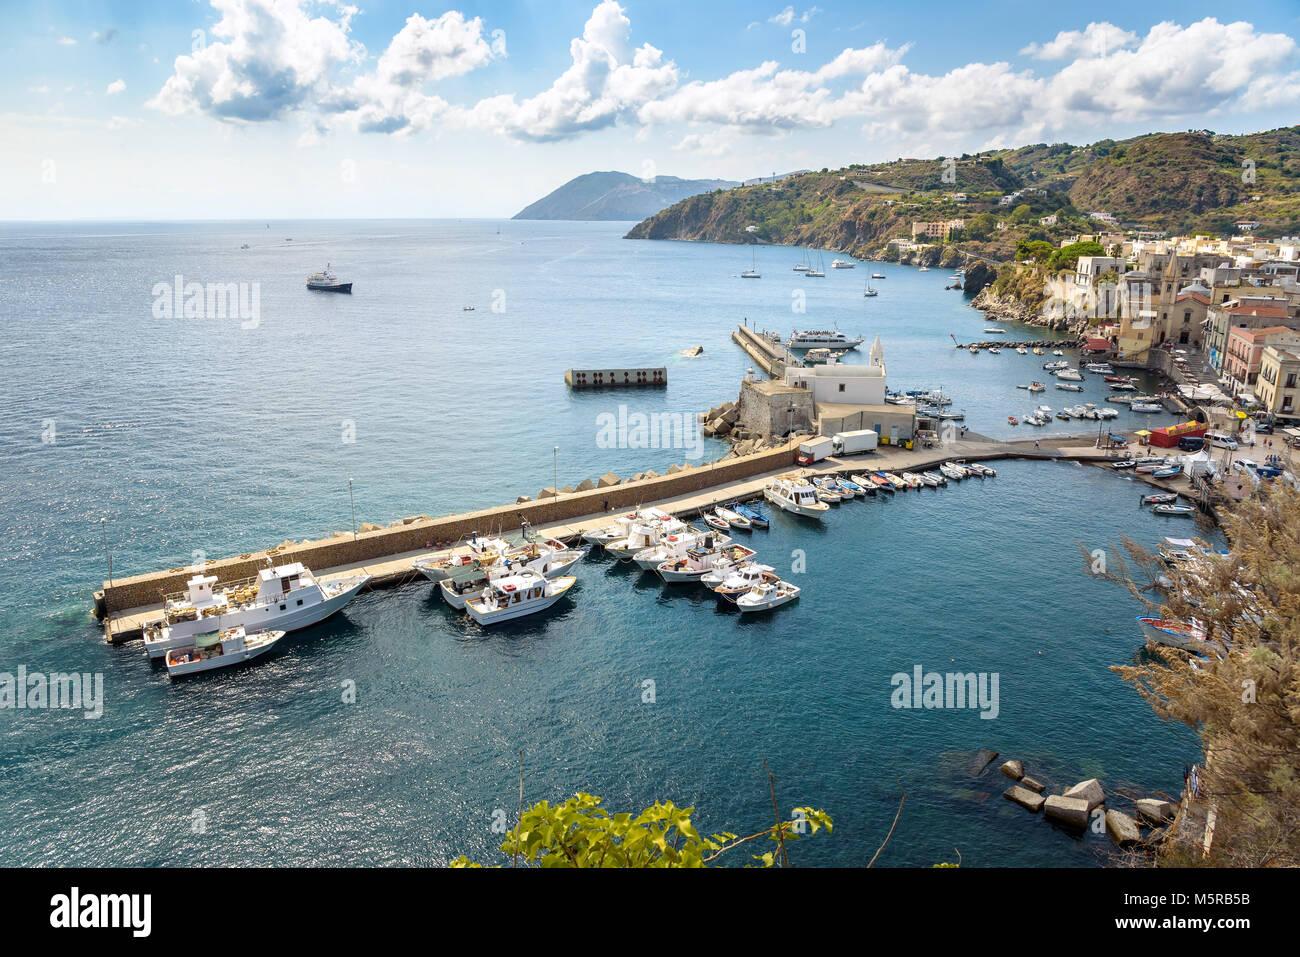 Aerial view of Marina Corta at the port of Lipari, Aeolian Islands, Italy Stock Photo